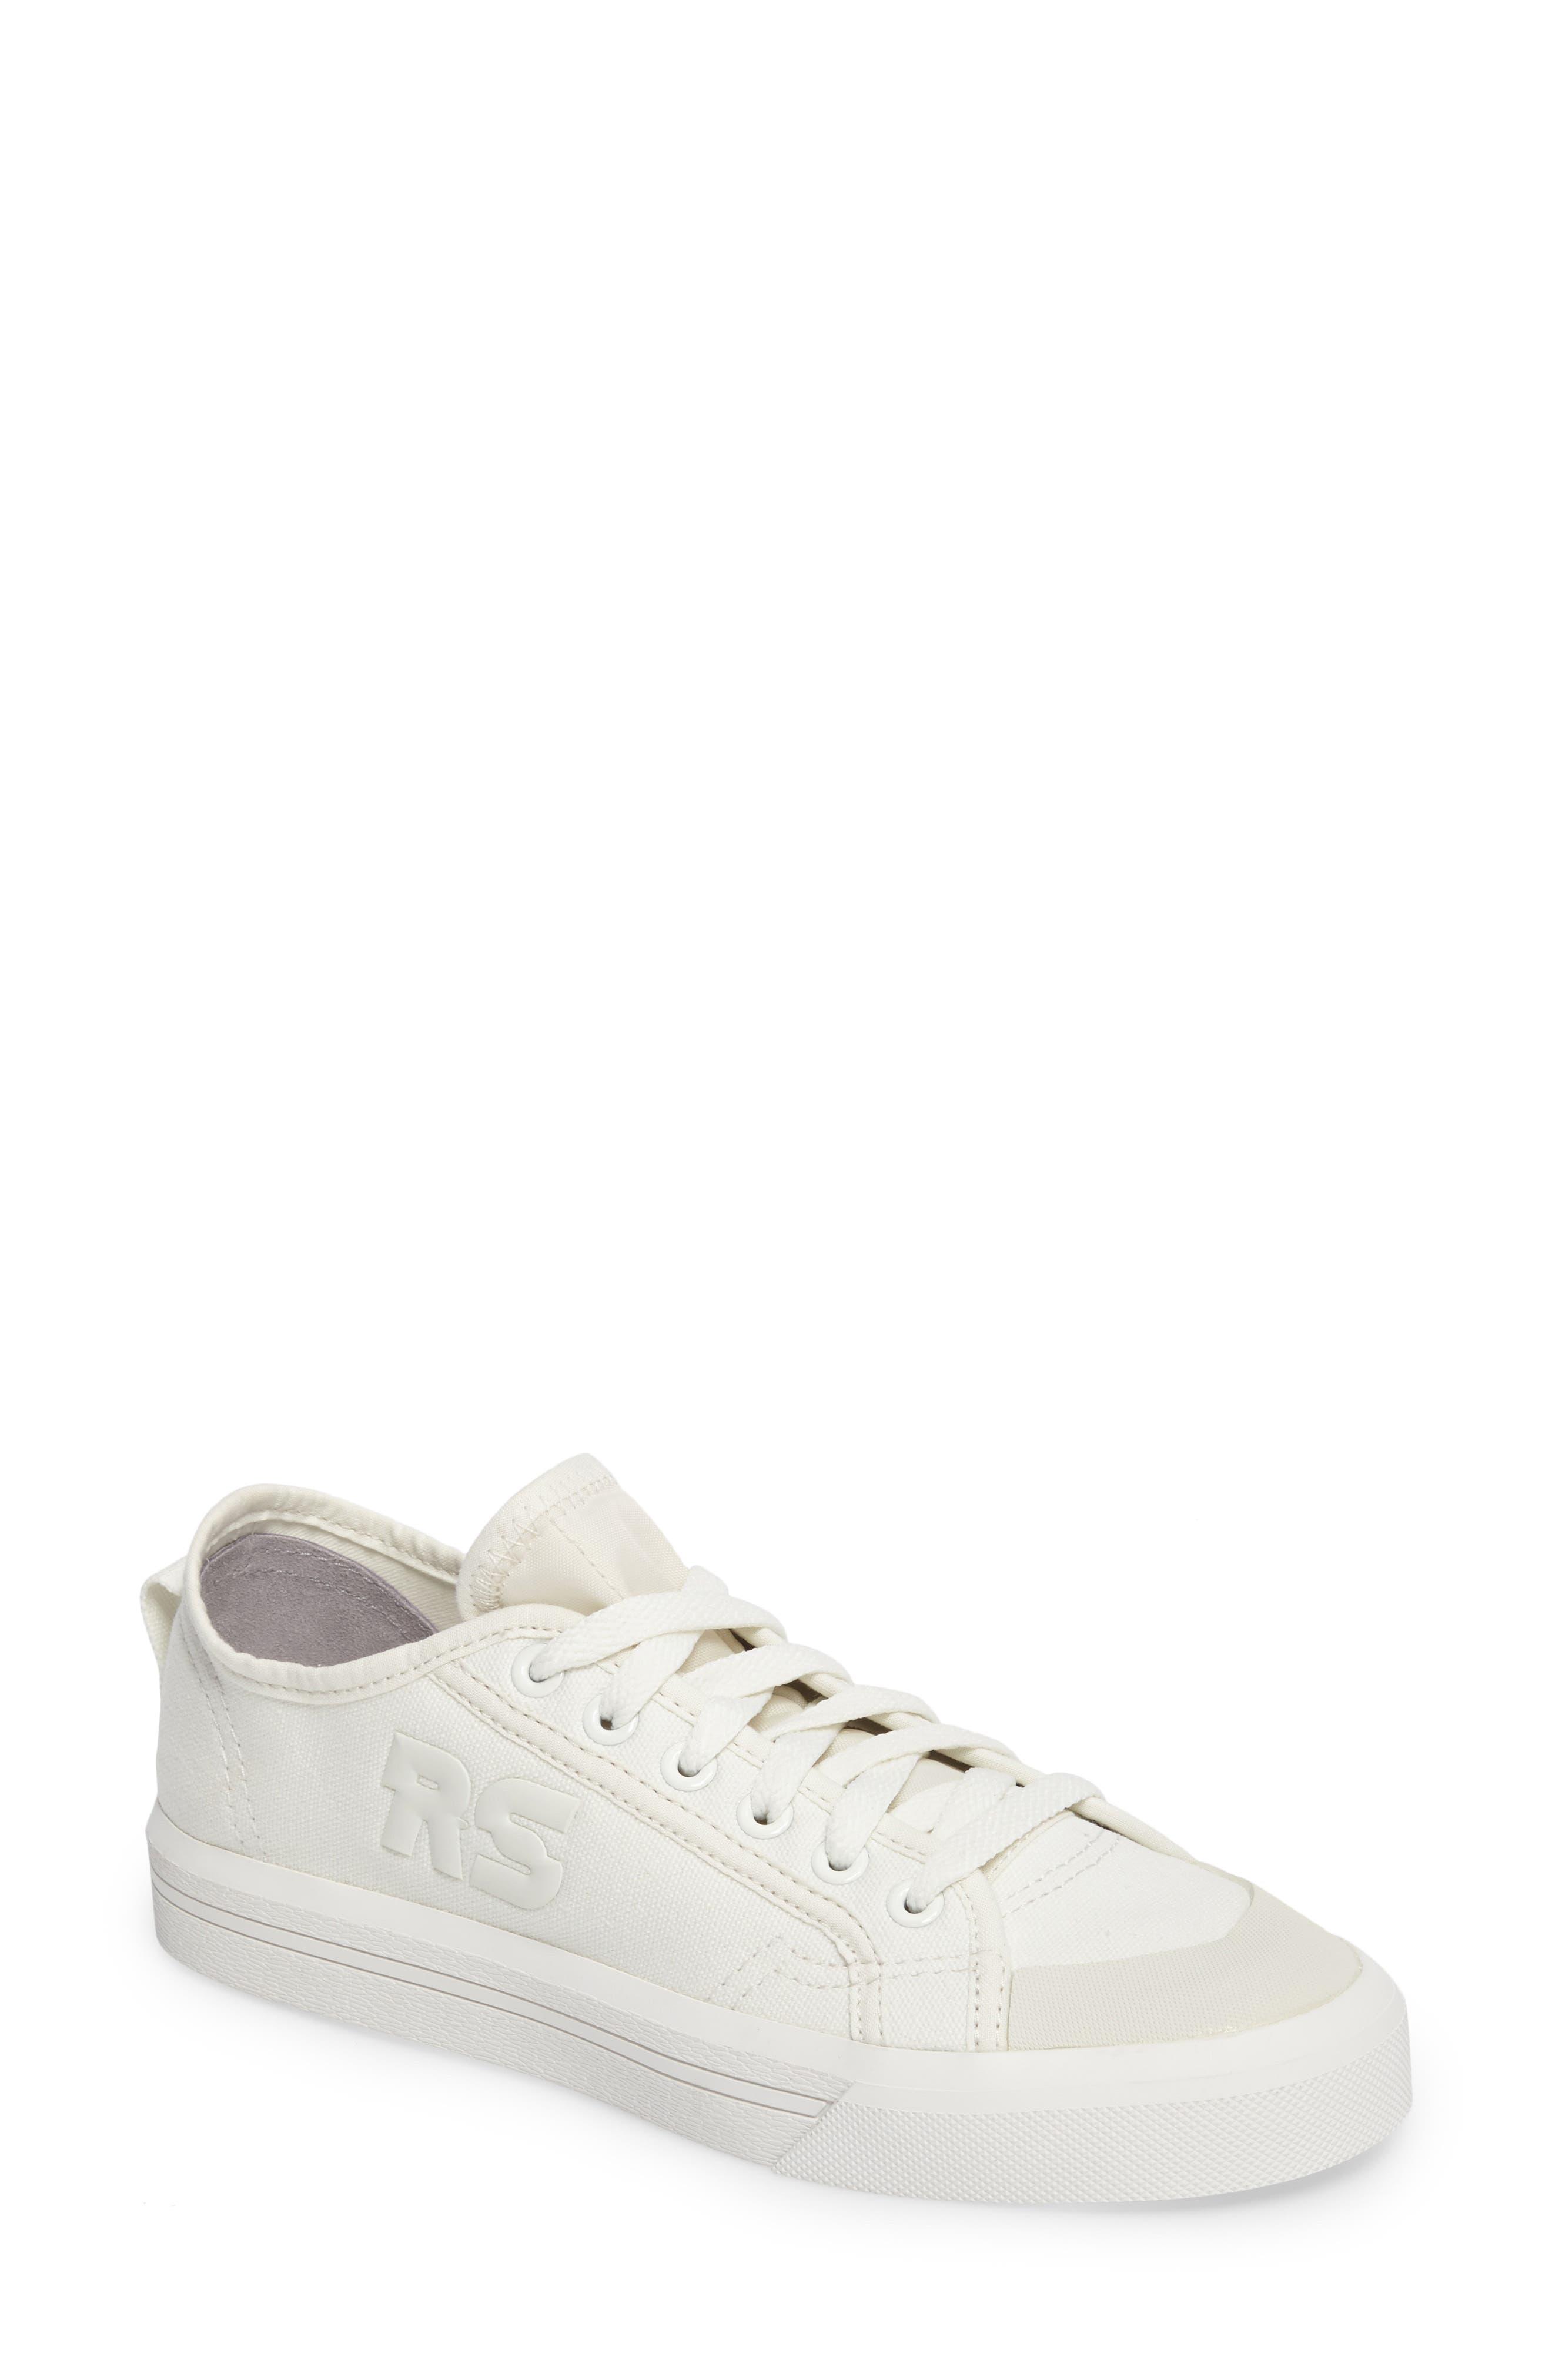 adidas by Raf Simons Spirit Low Top Sneaker,                             Main thumbnail 2, color,